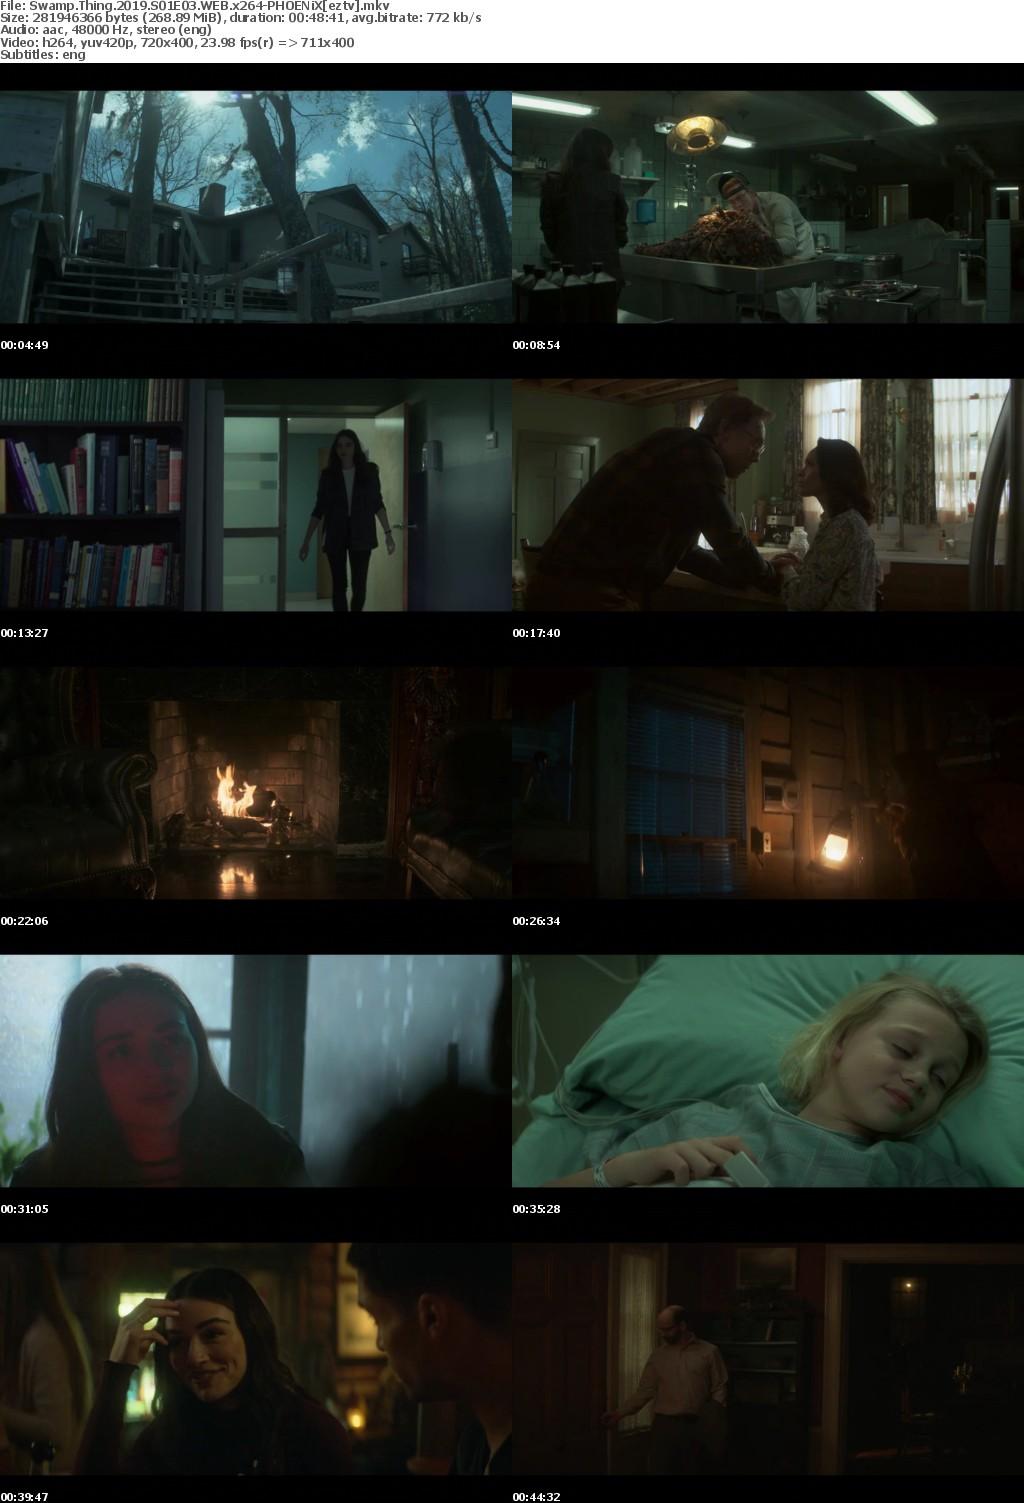 Swamp Thing 2019 S01E03 WEB x264-PHOENiX